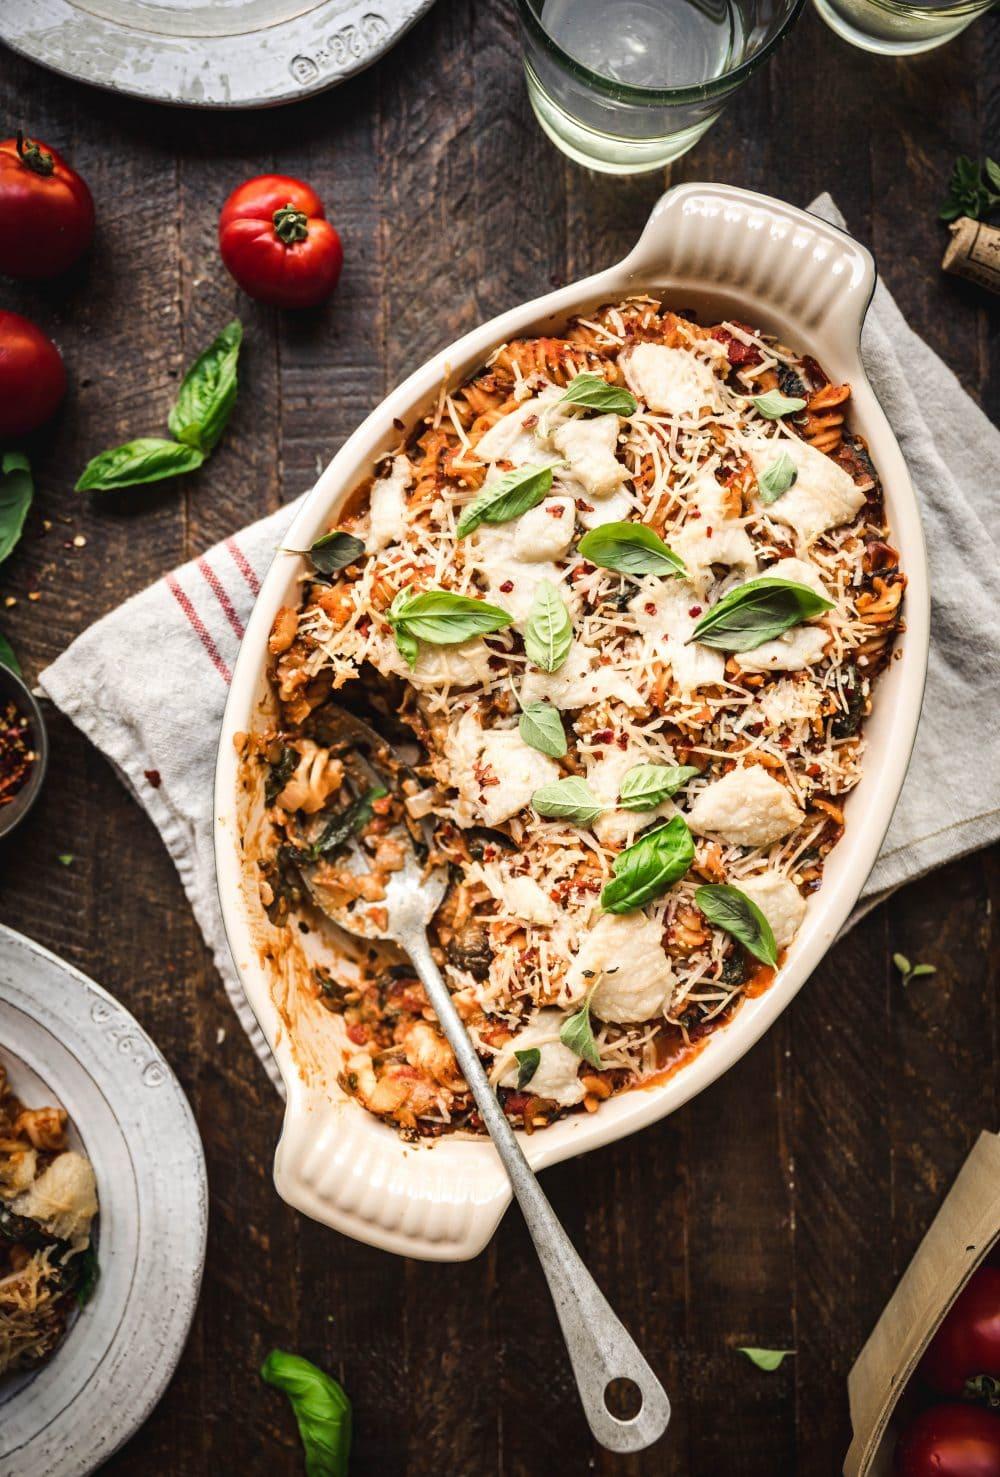 overhead view of vegan pasta bake with vegan cheese